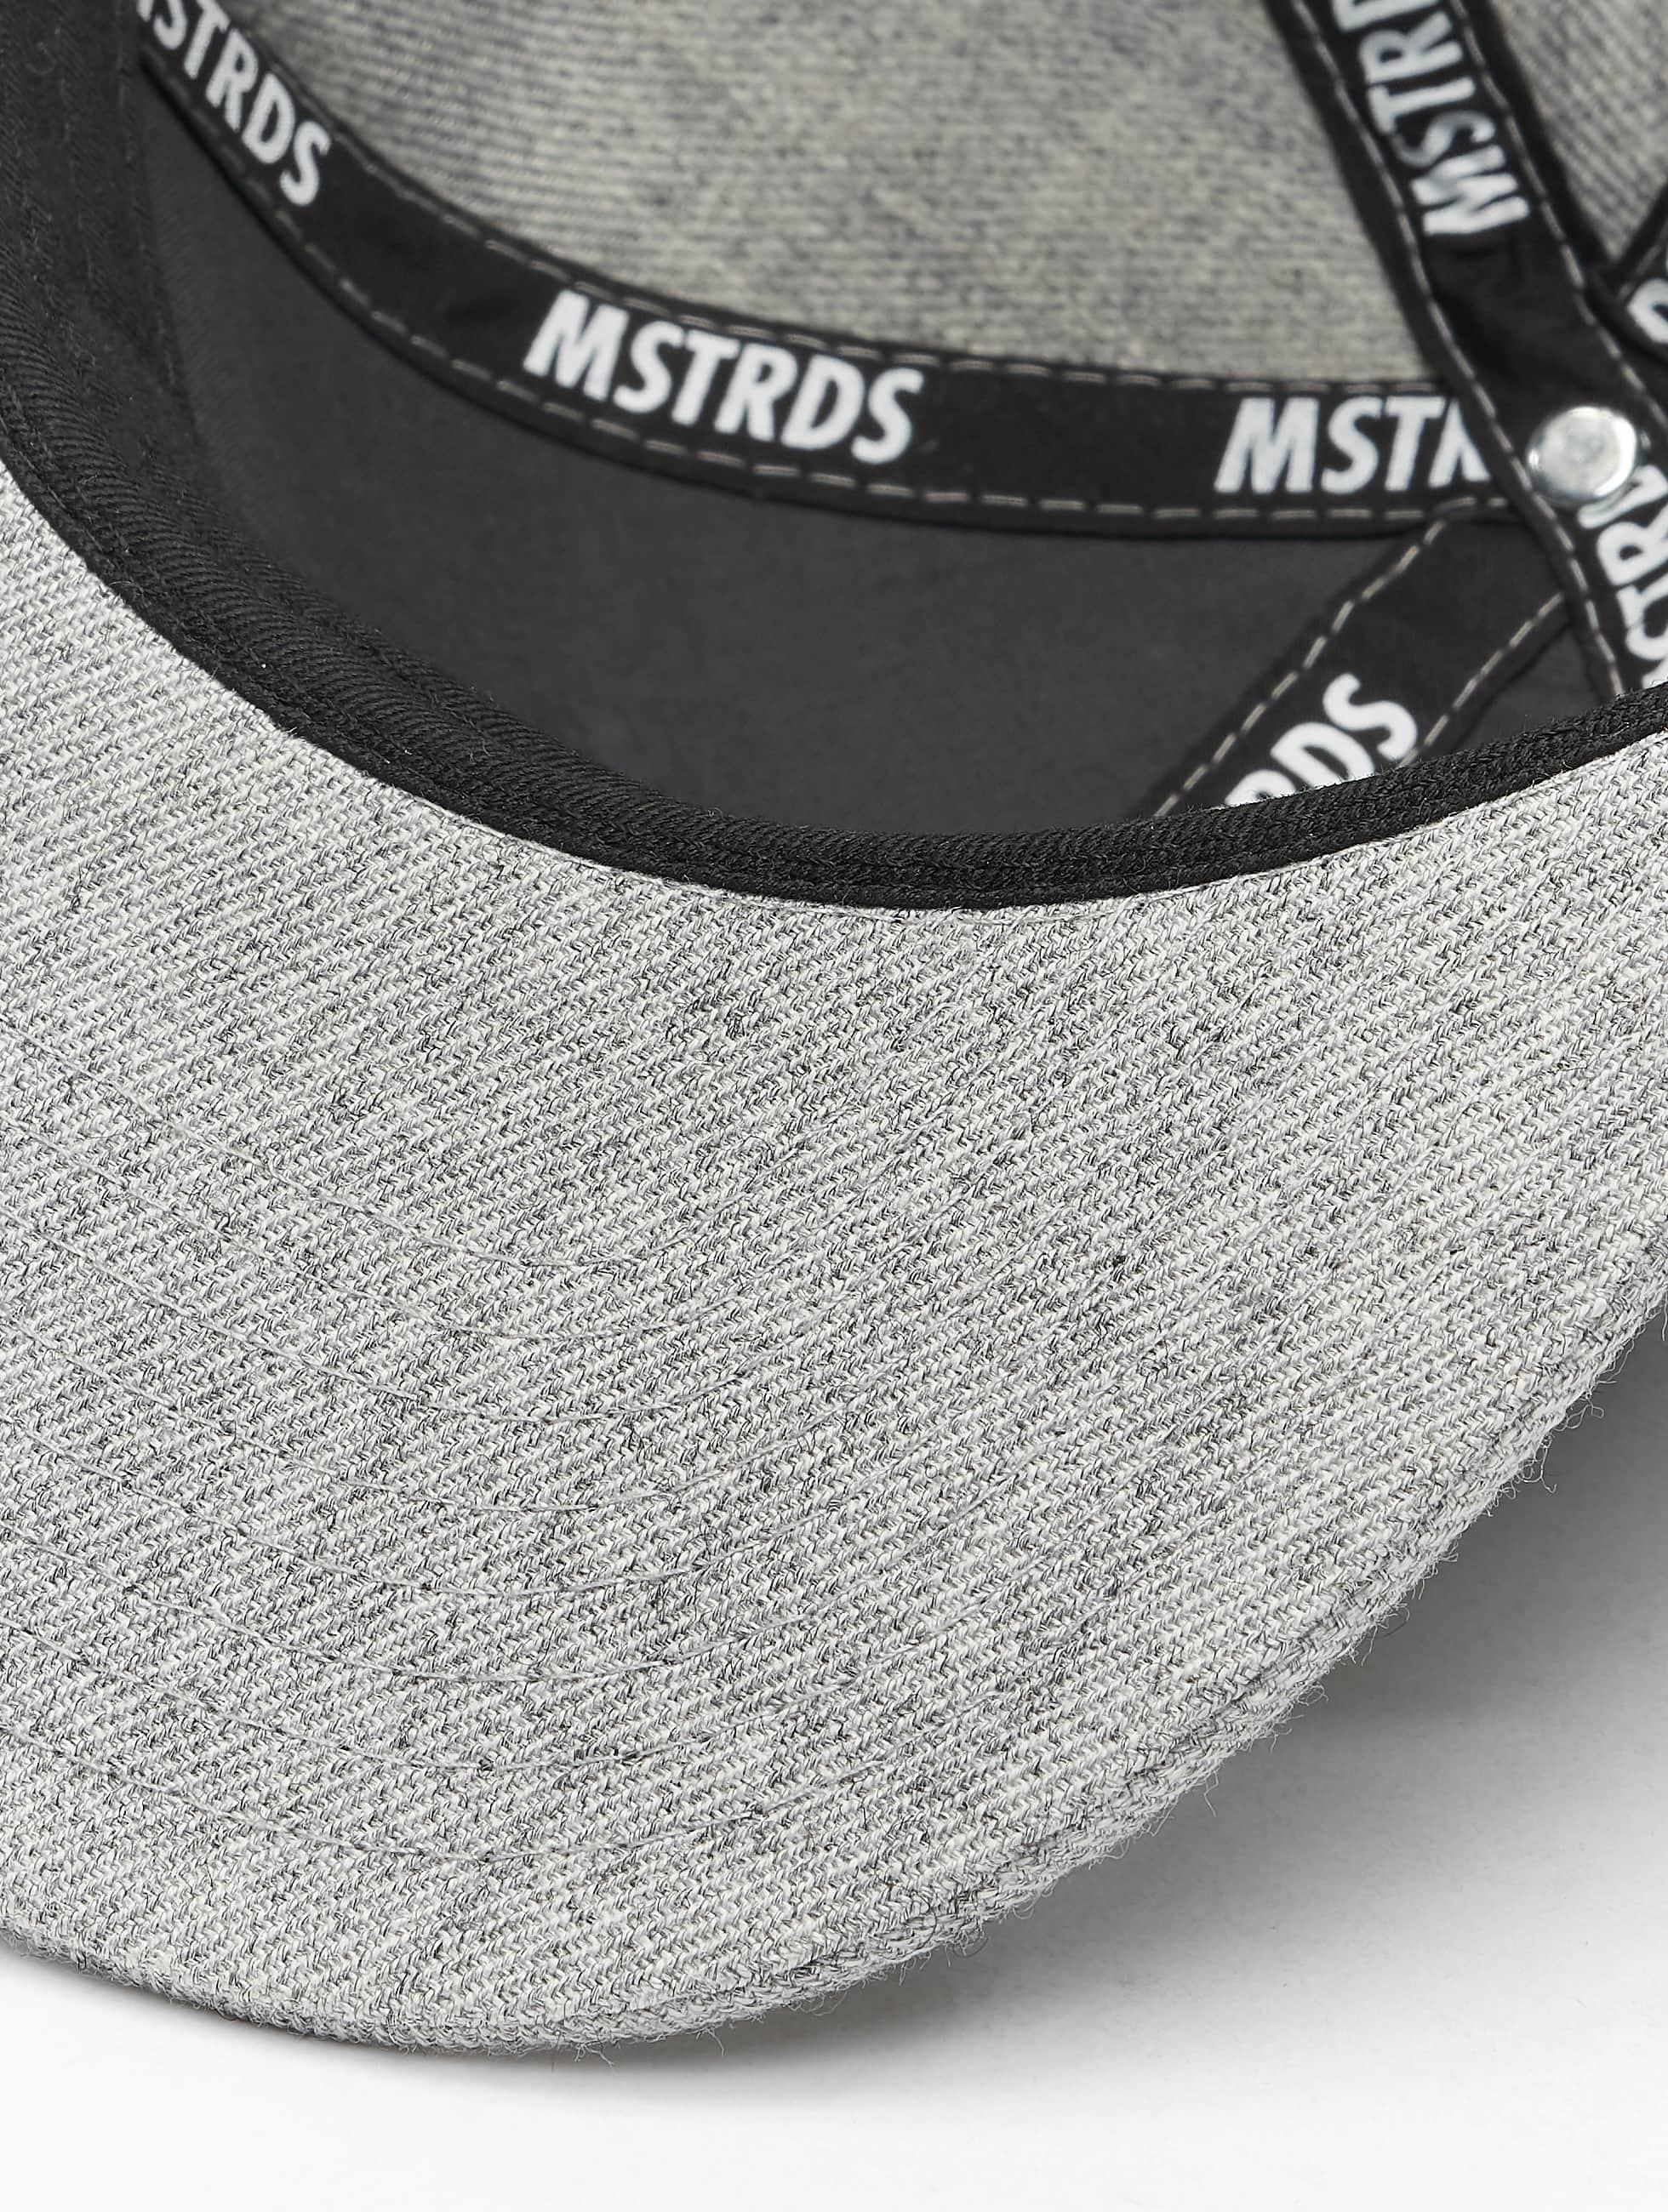 MSTRDS Snapback Caps X Letter szary